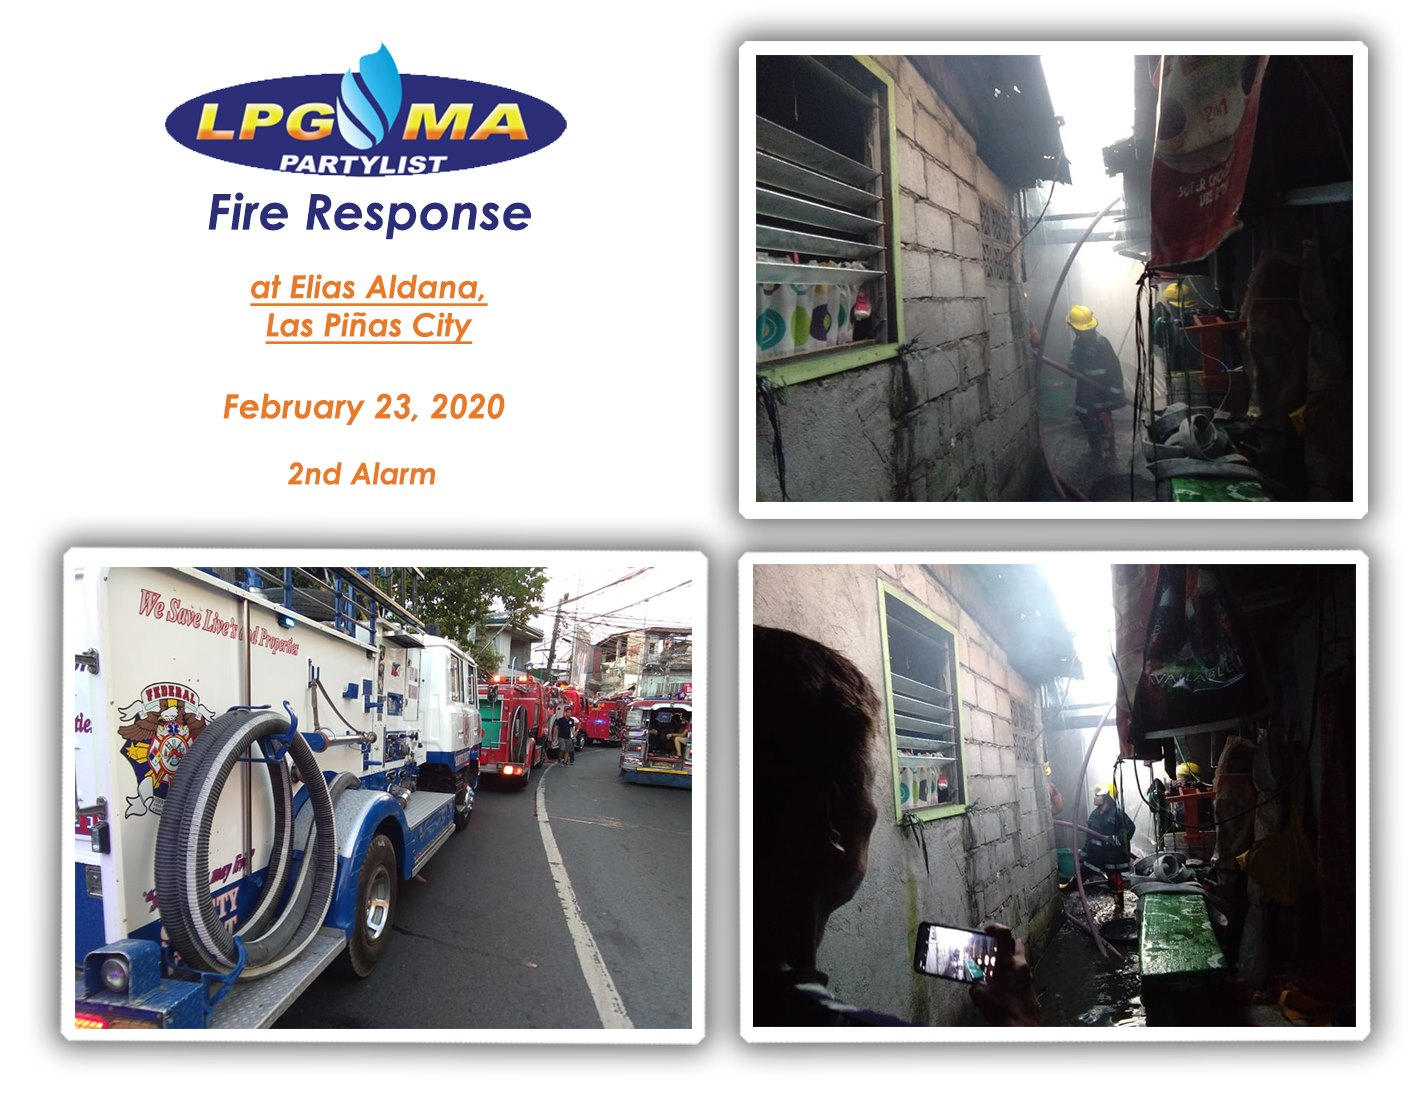 LPGMA Fire Response in Elias Aldana